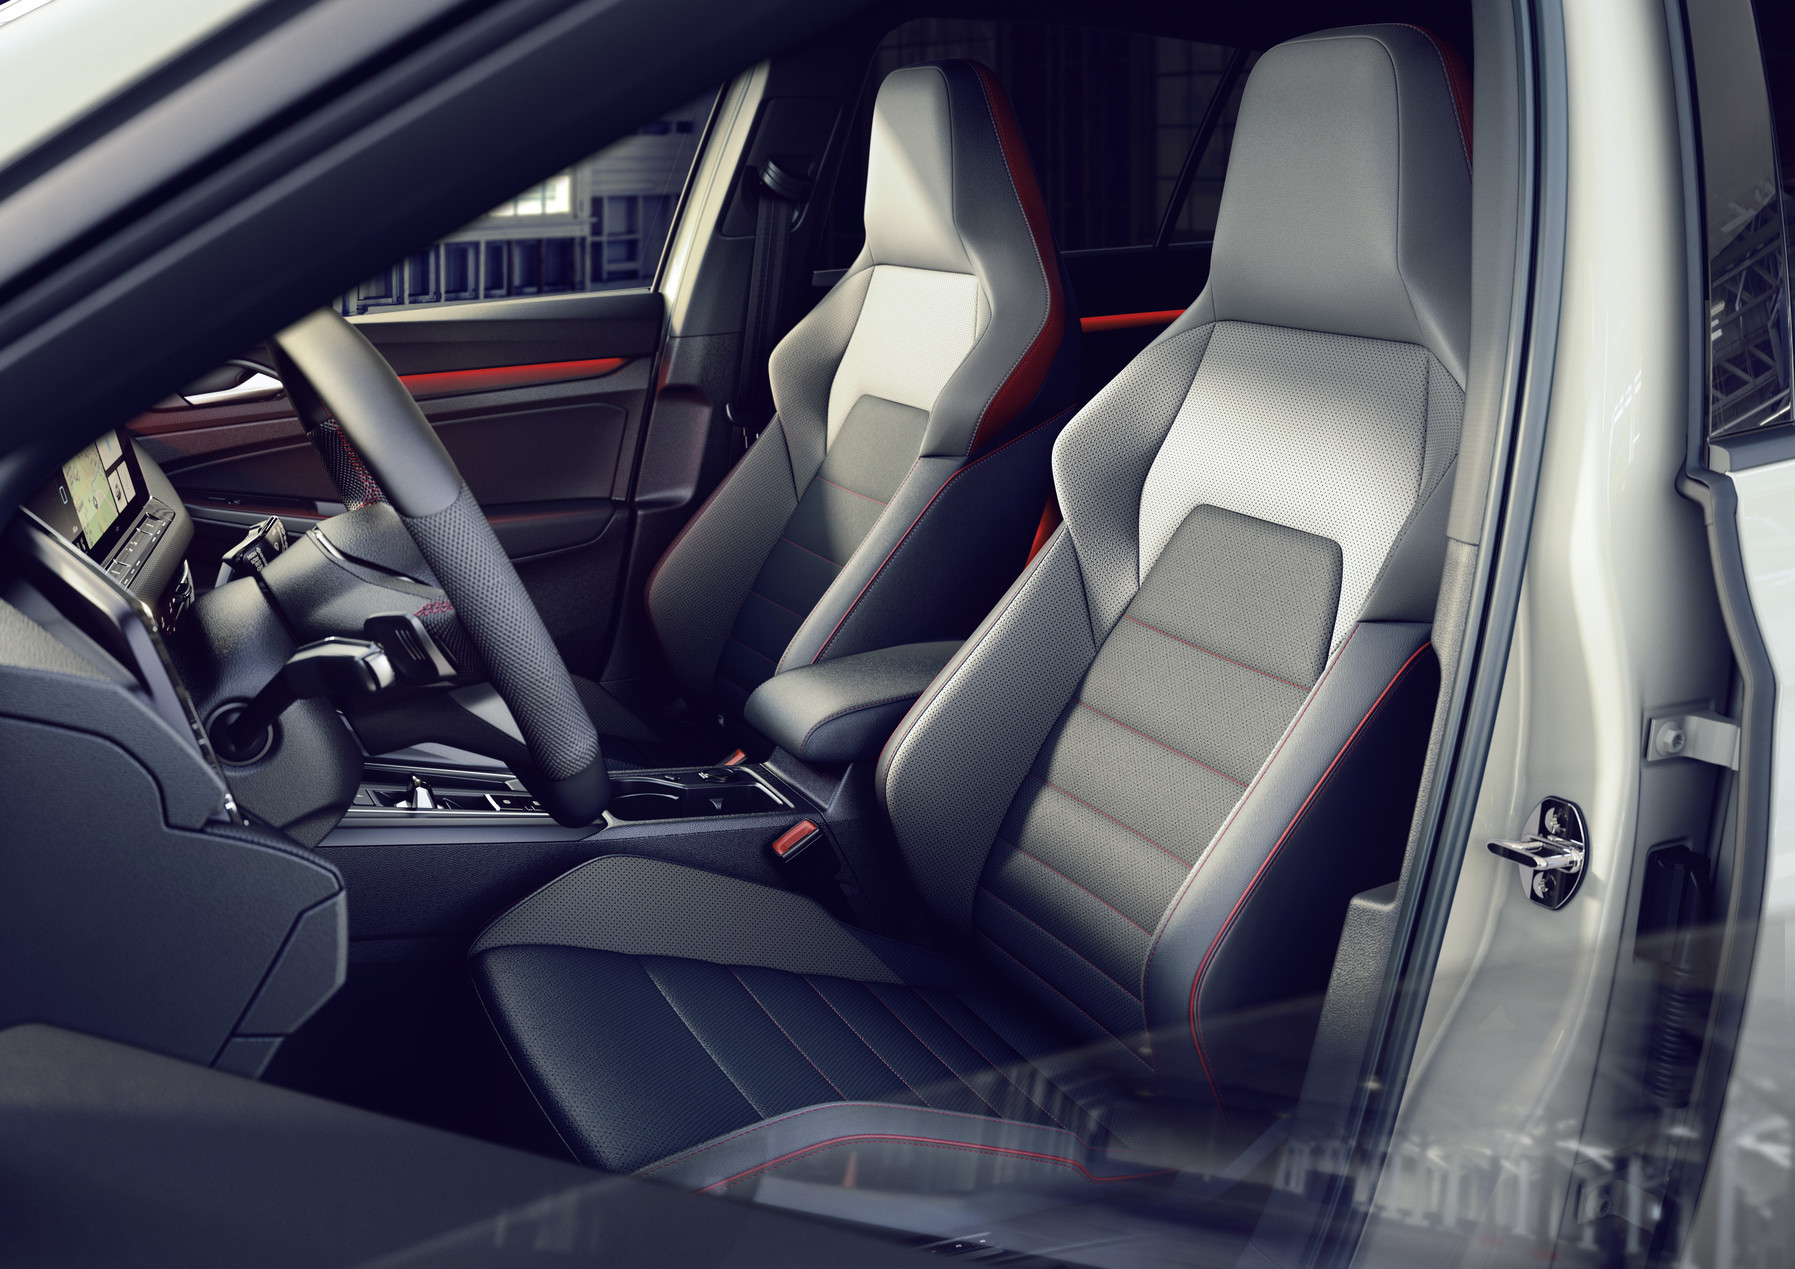 The new Volkswagen Golf GTI Clubsport